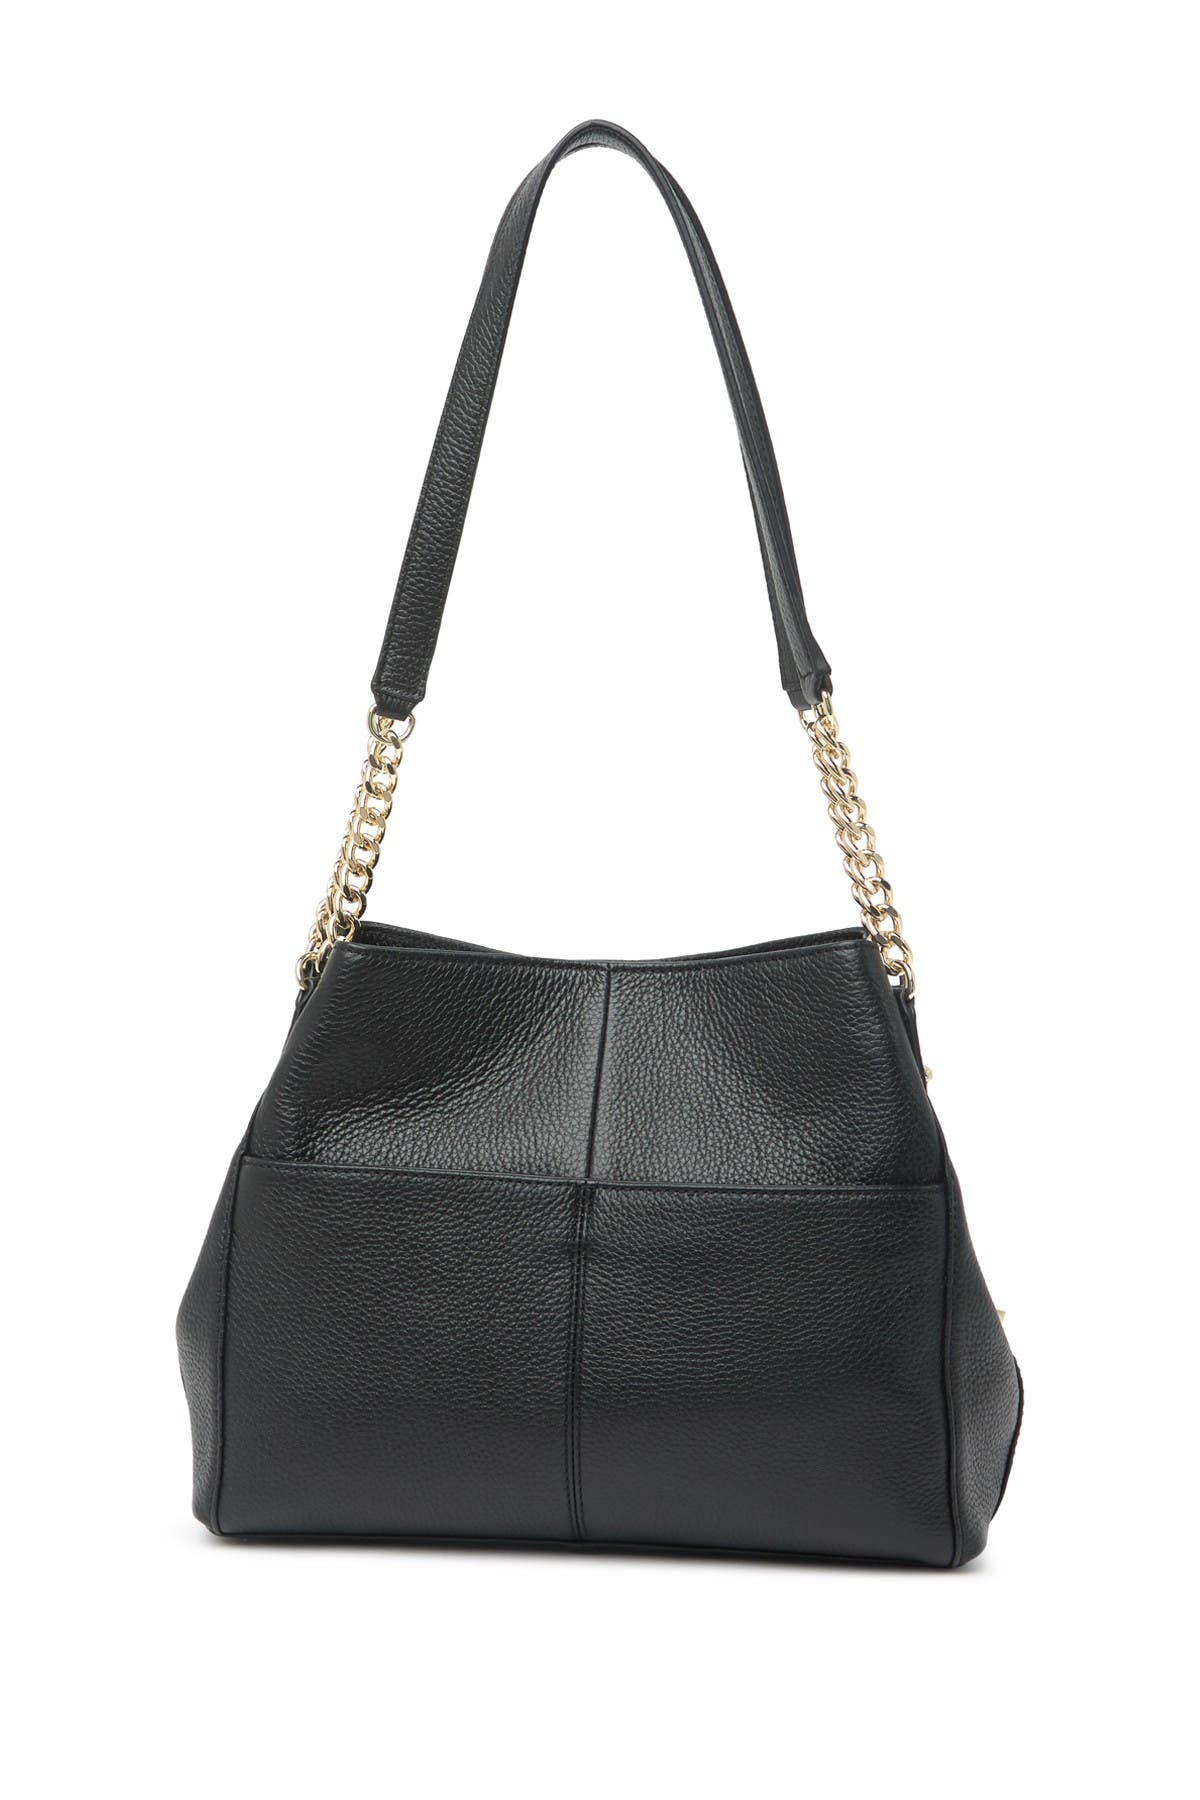 Image of Karl Lagerfeld Paris Bouquet Hobo Bag